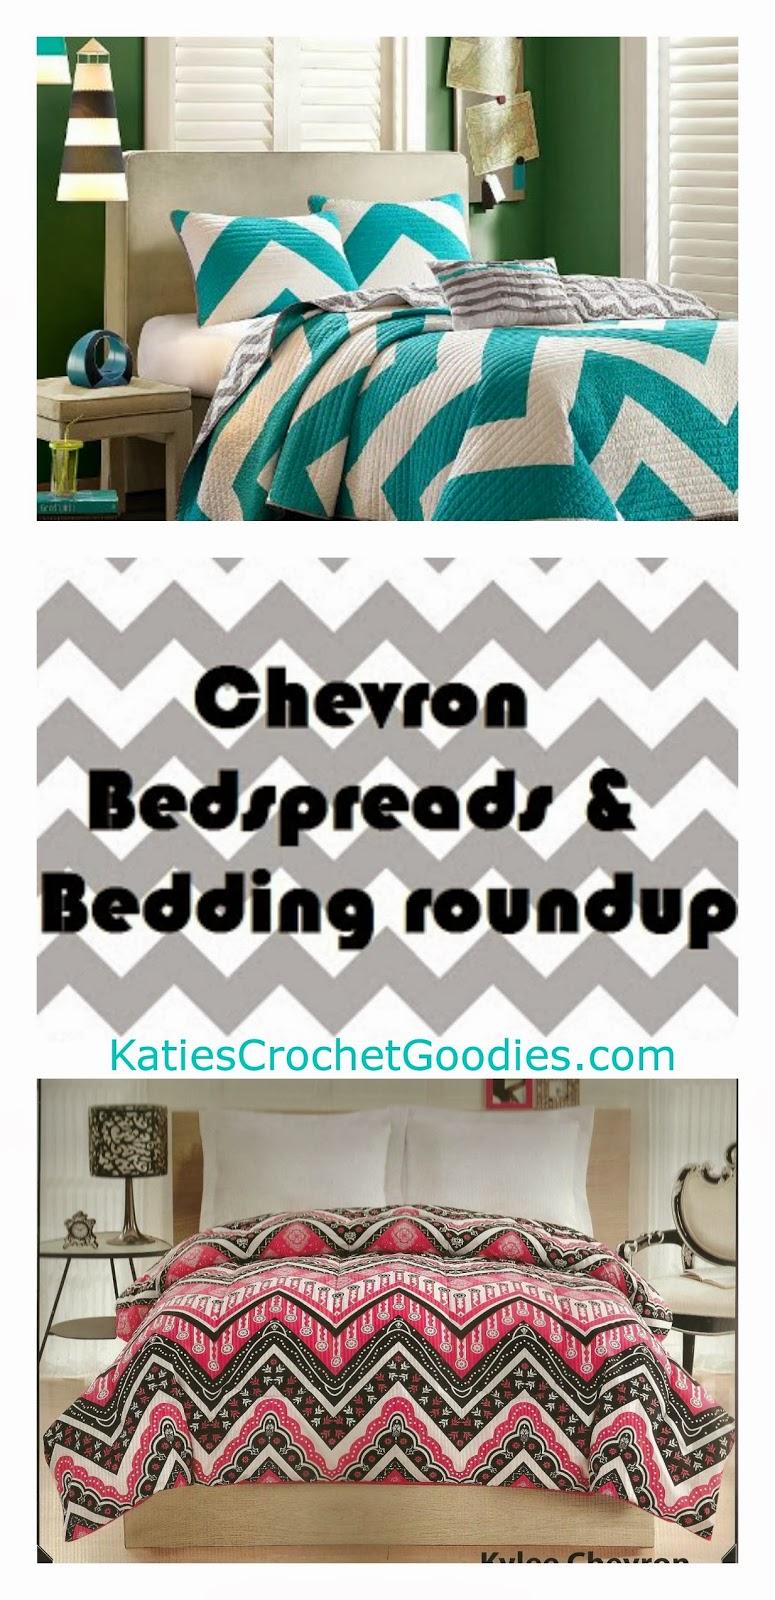 chevron bedspreads